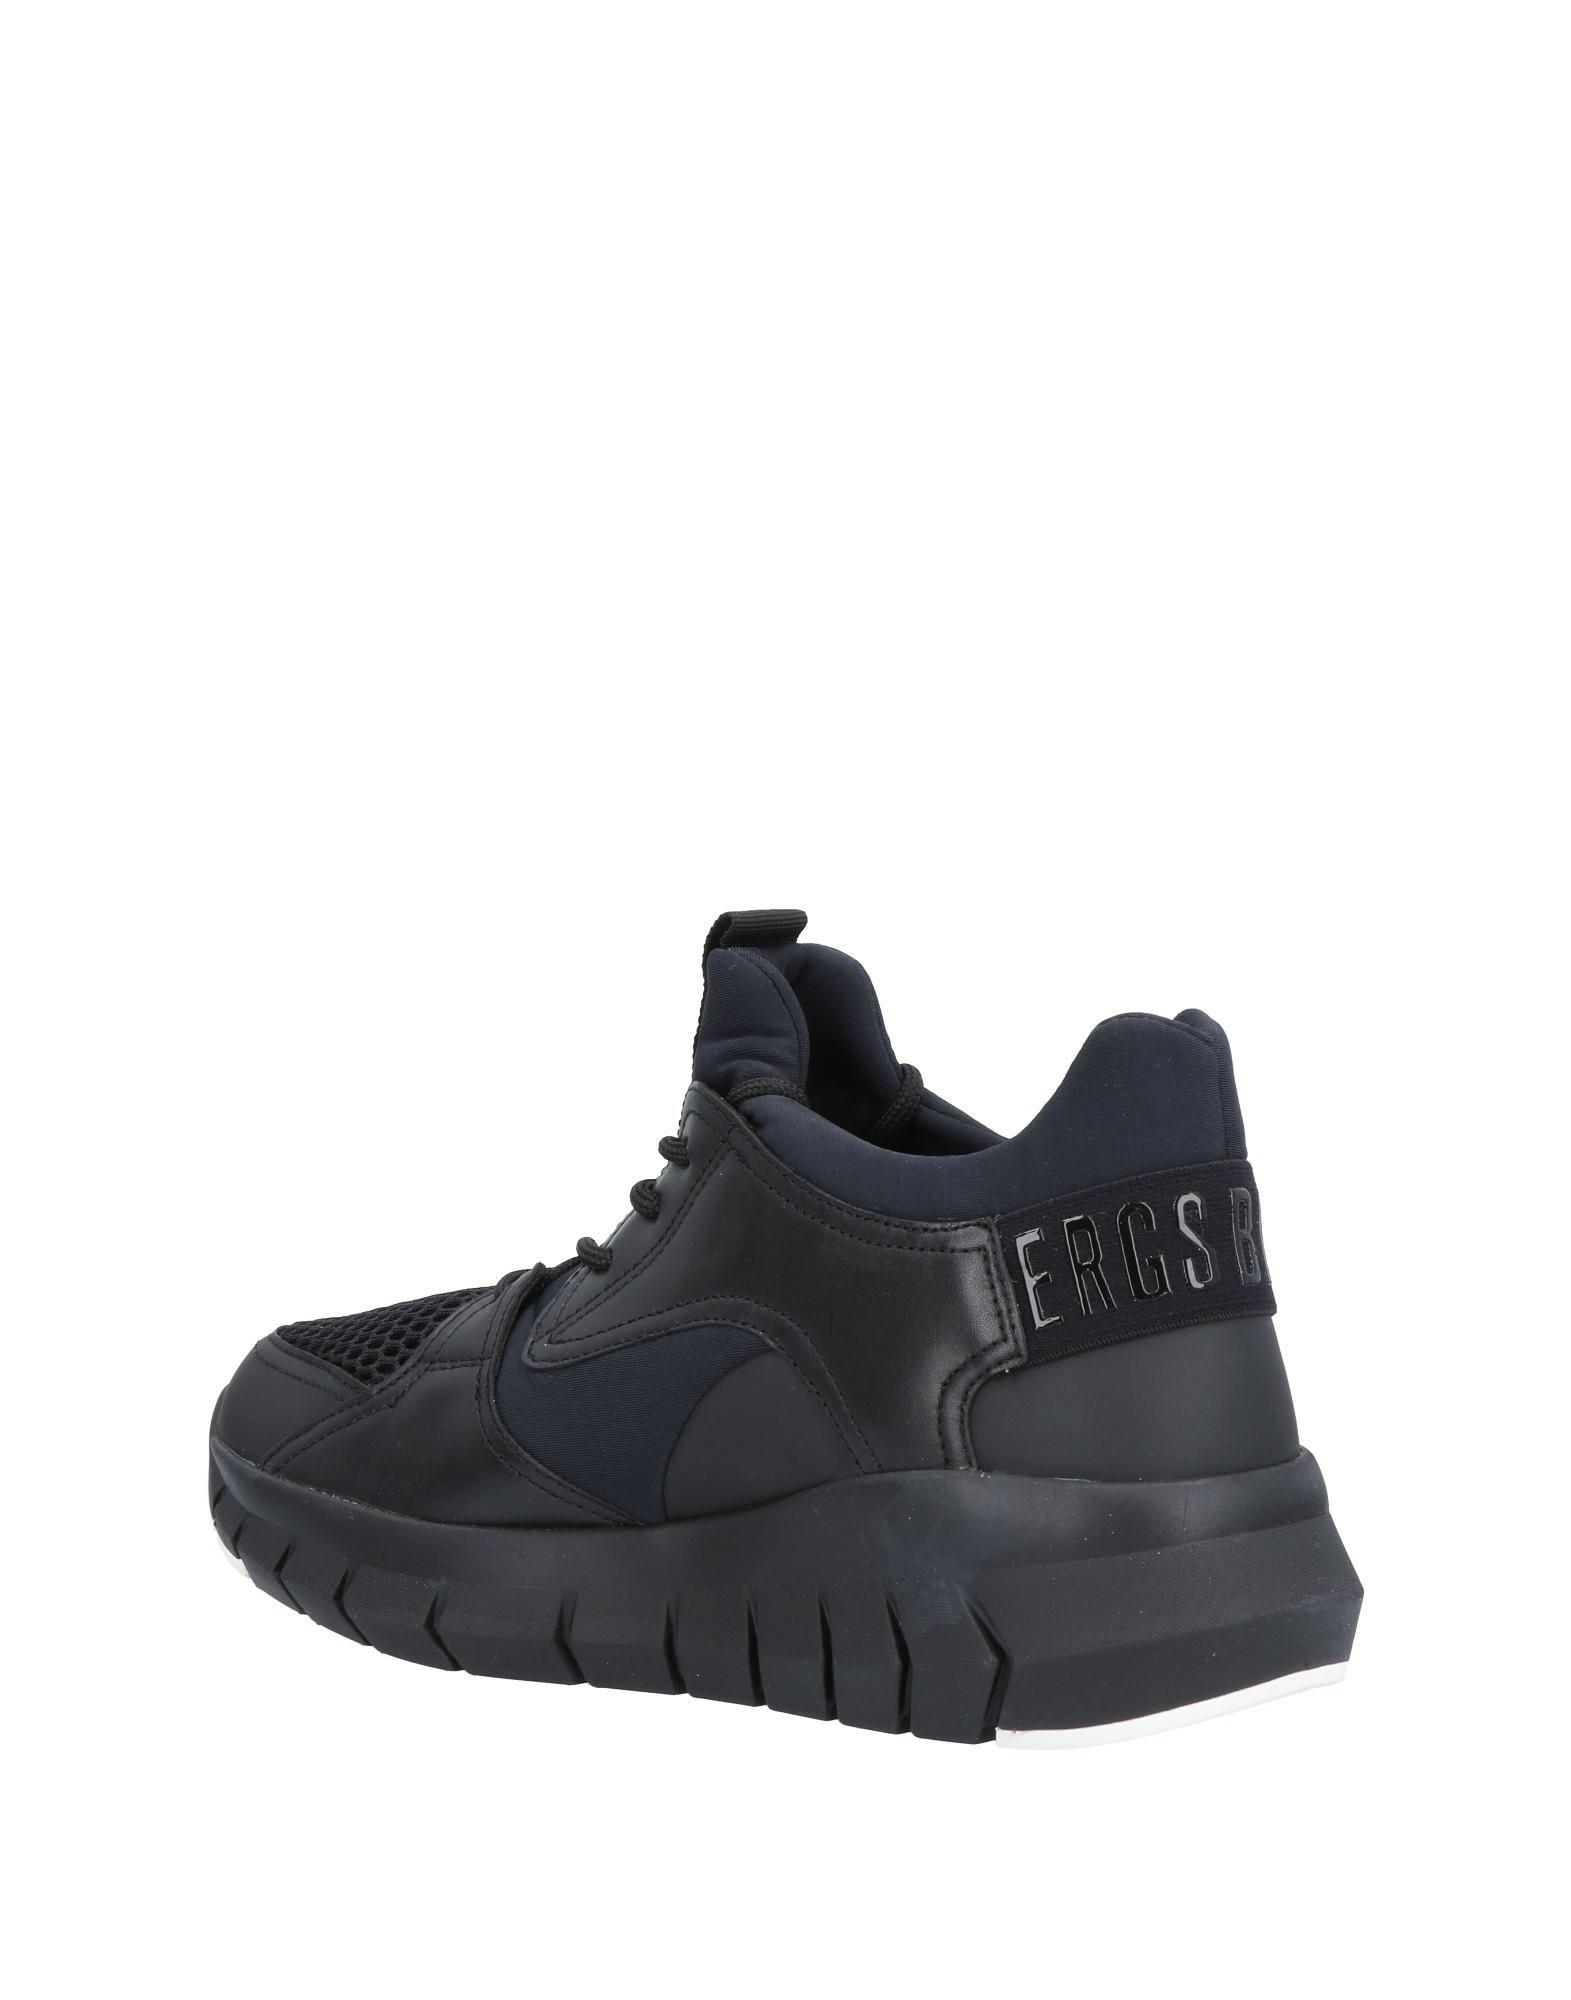 Rabatt Bikkembergs echte Schuhe Bikkembergs Rabatt Sneakers Herren  11449954KB 937fe2